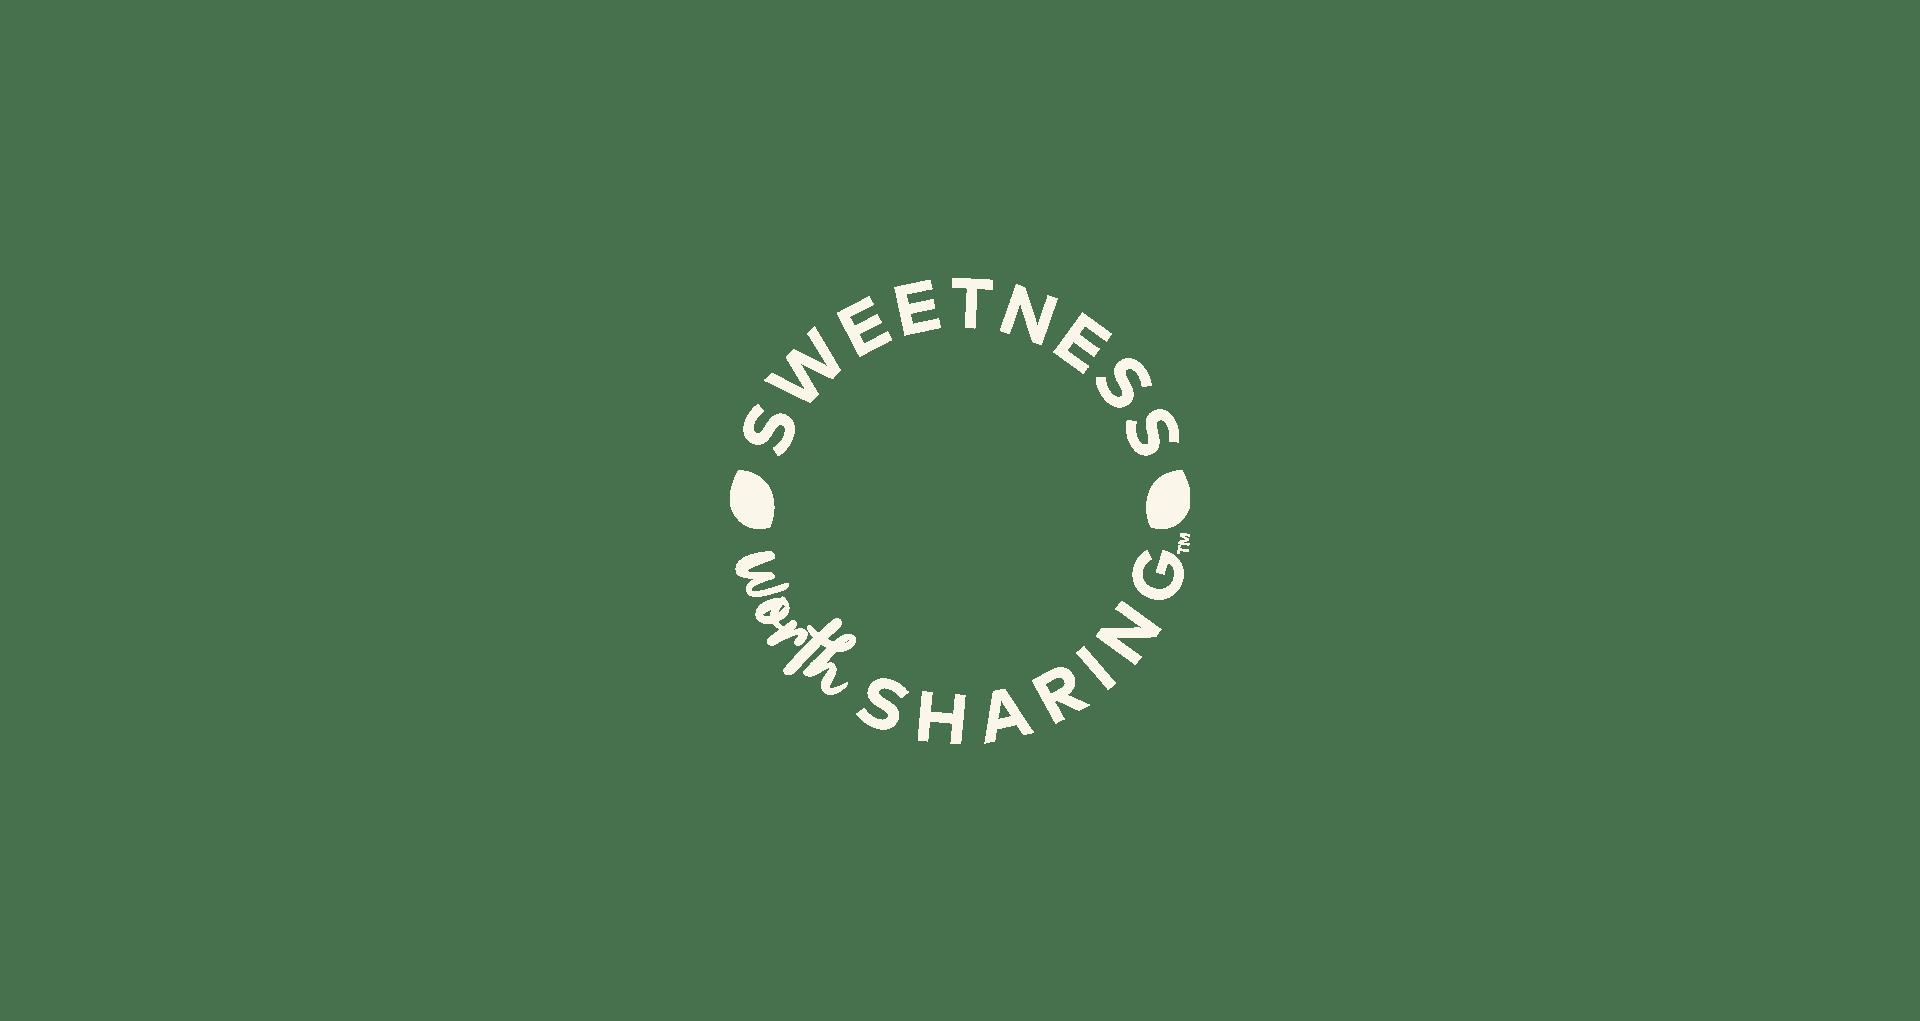 Sweetness Worth Sharing